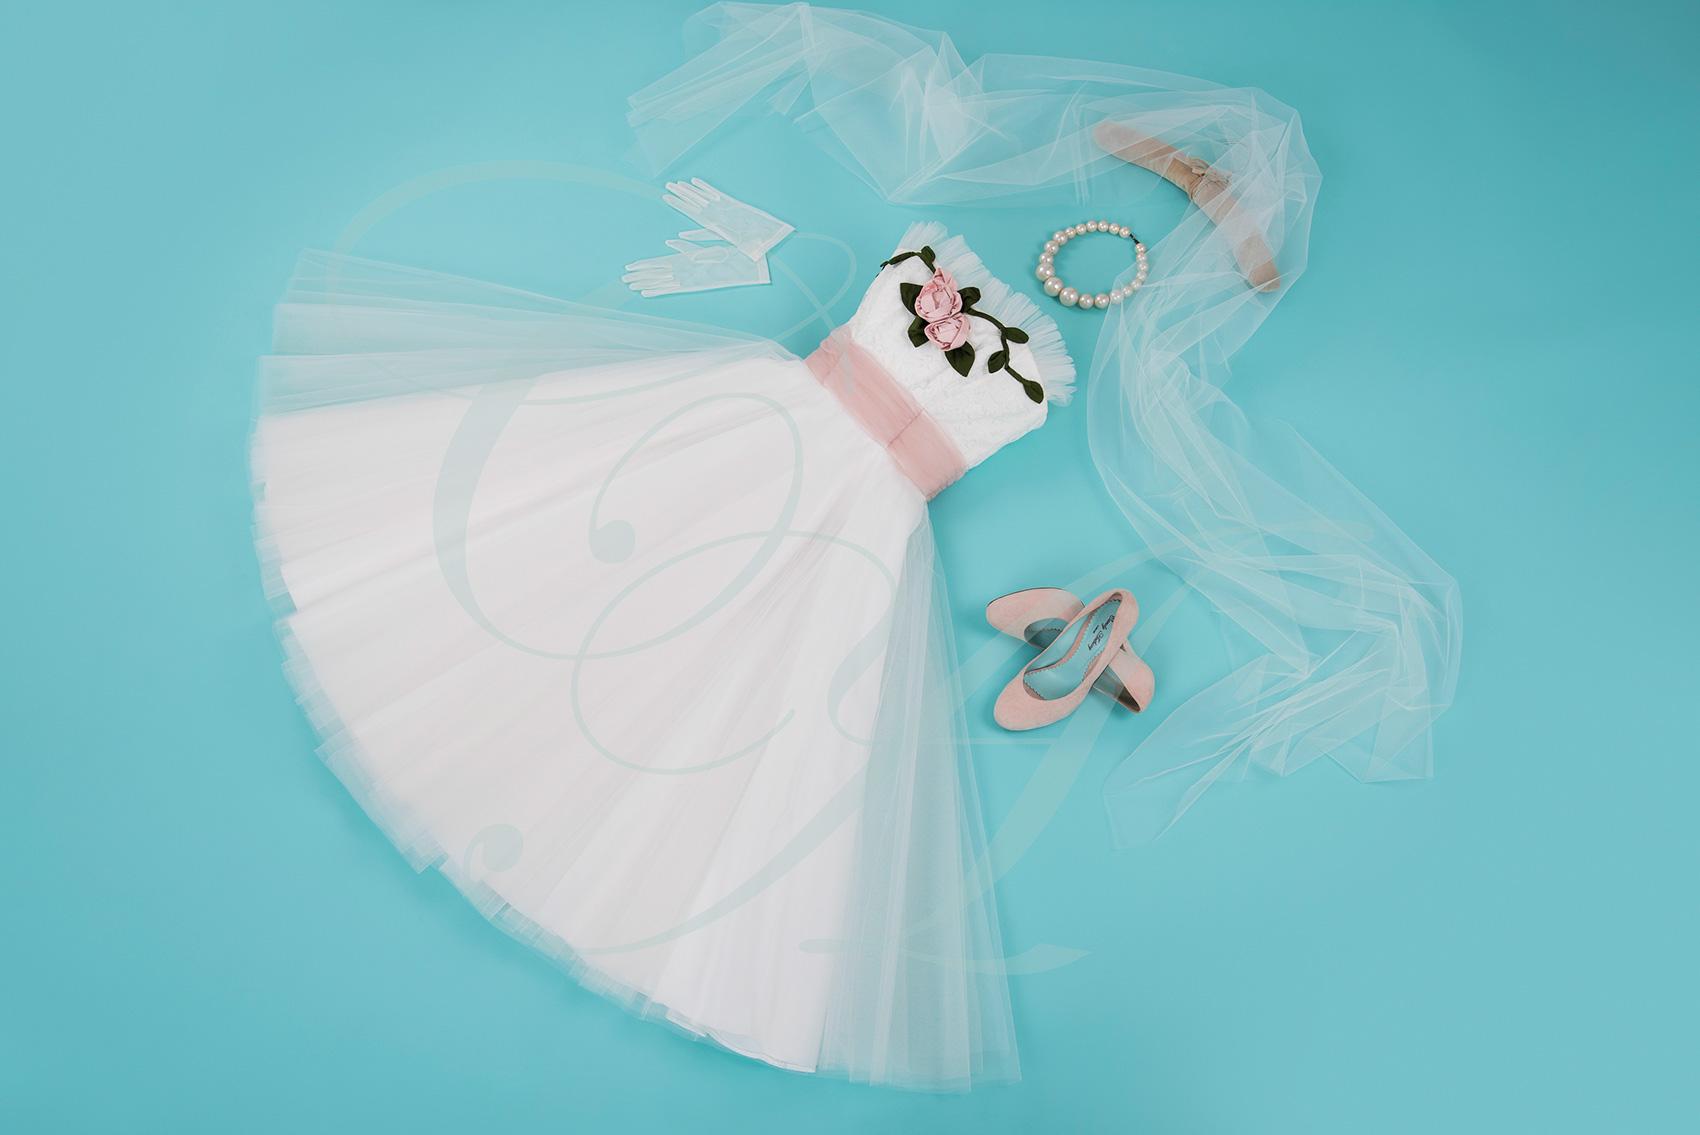 bridalspecial2 - Bespoke